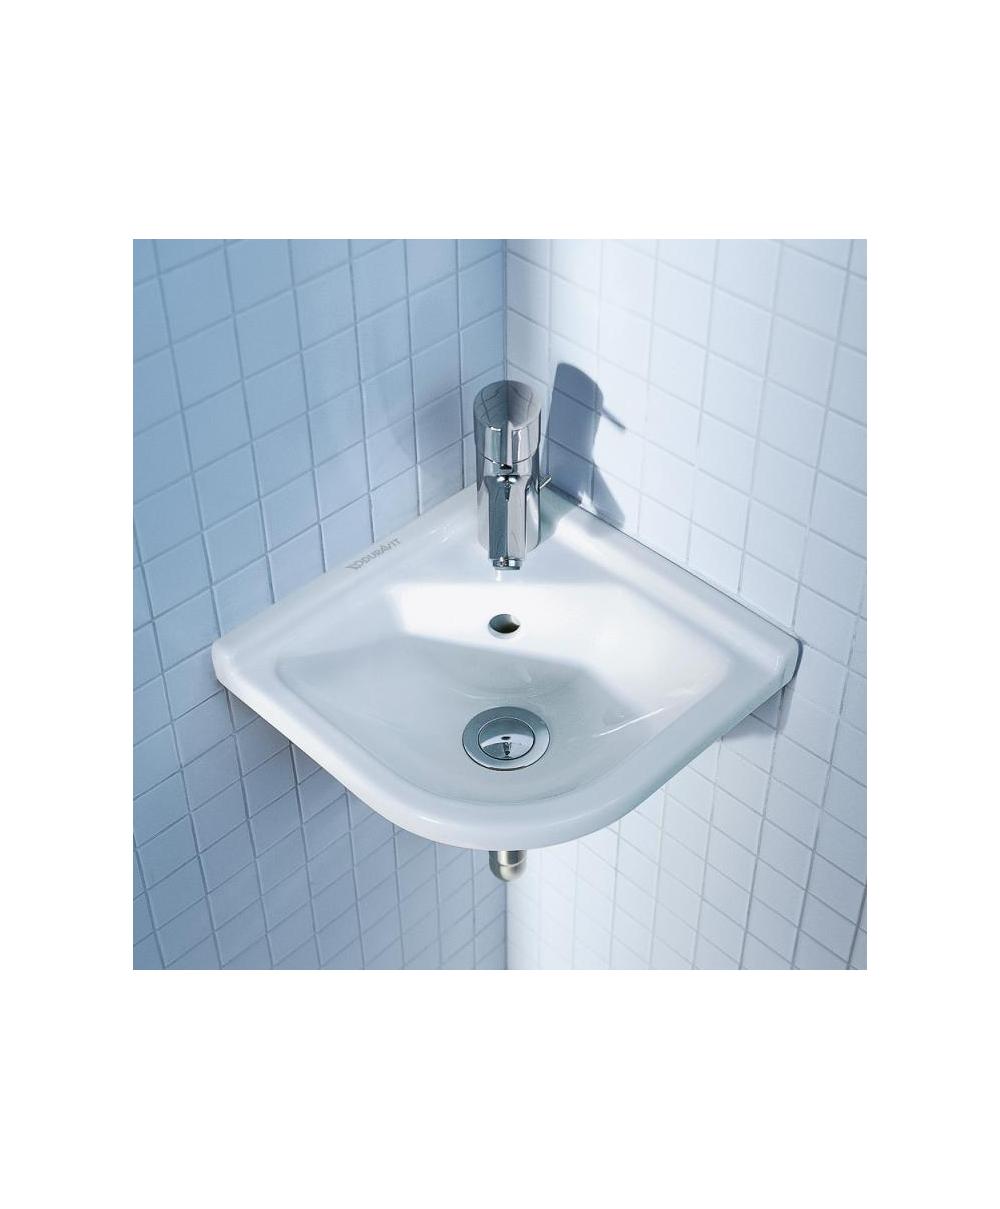 Starck 3 Cloakroom Corner Washbasin